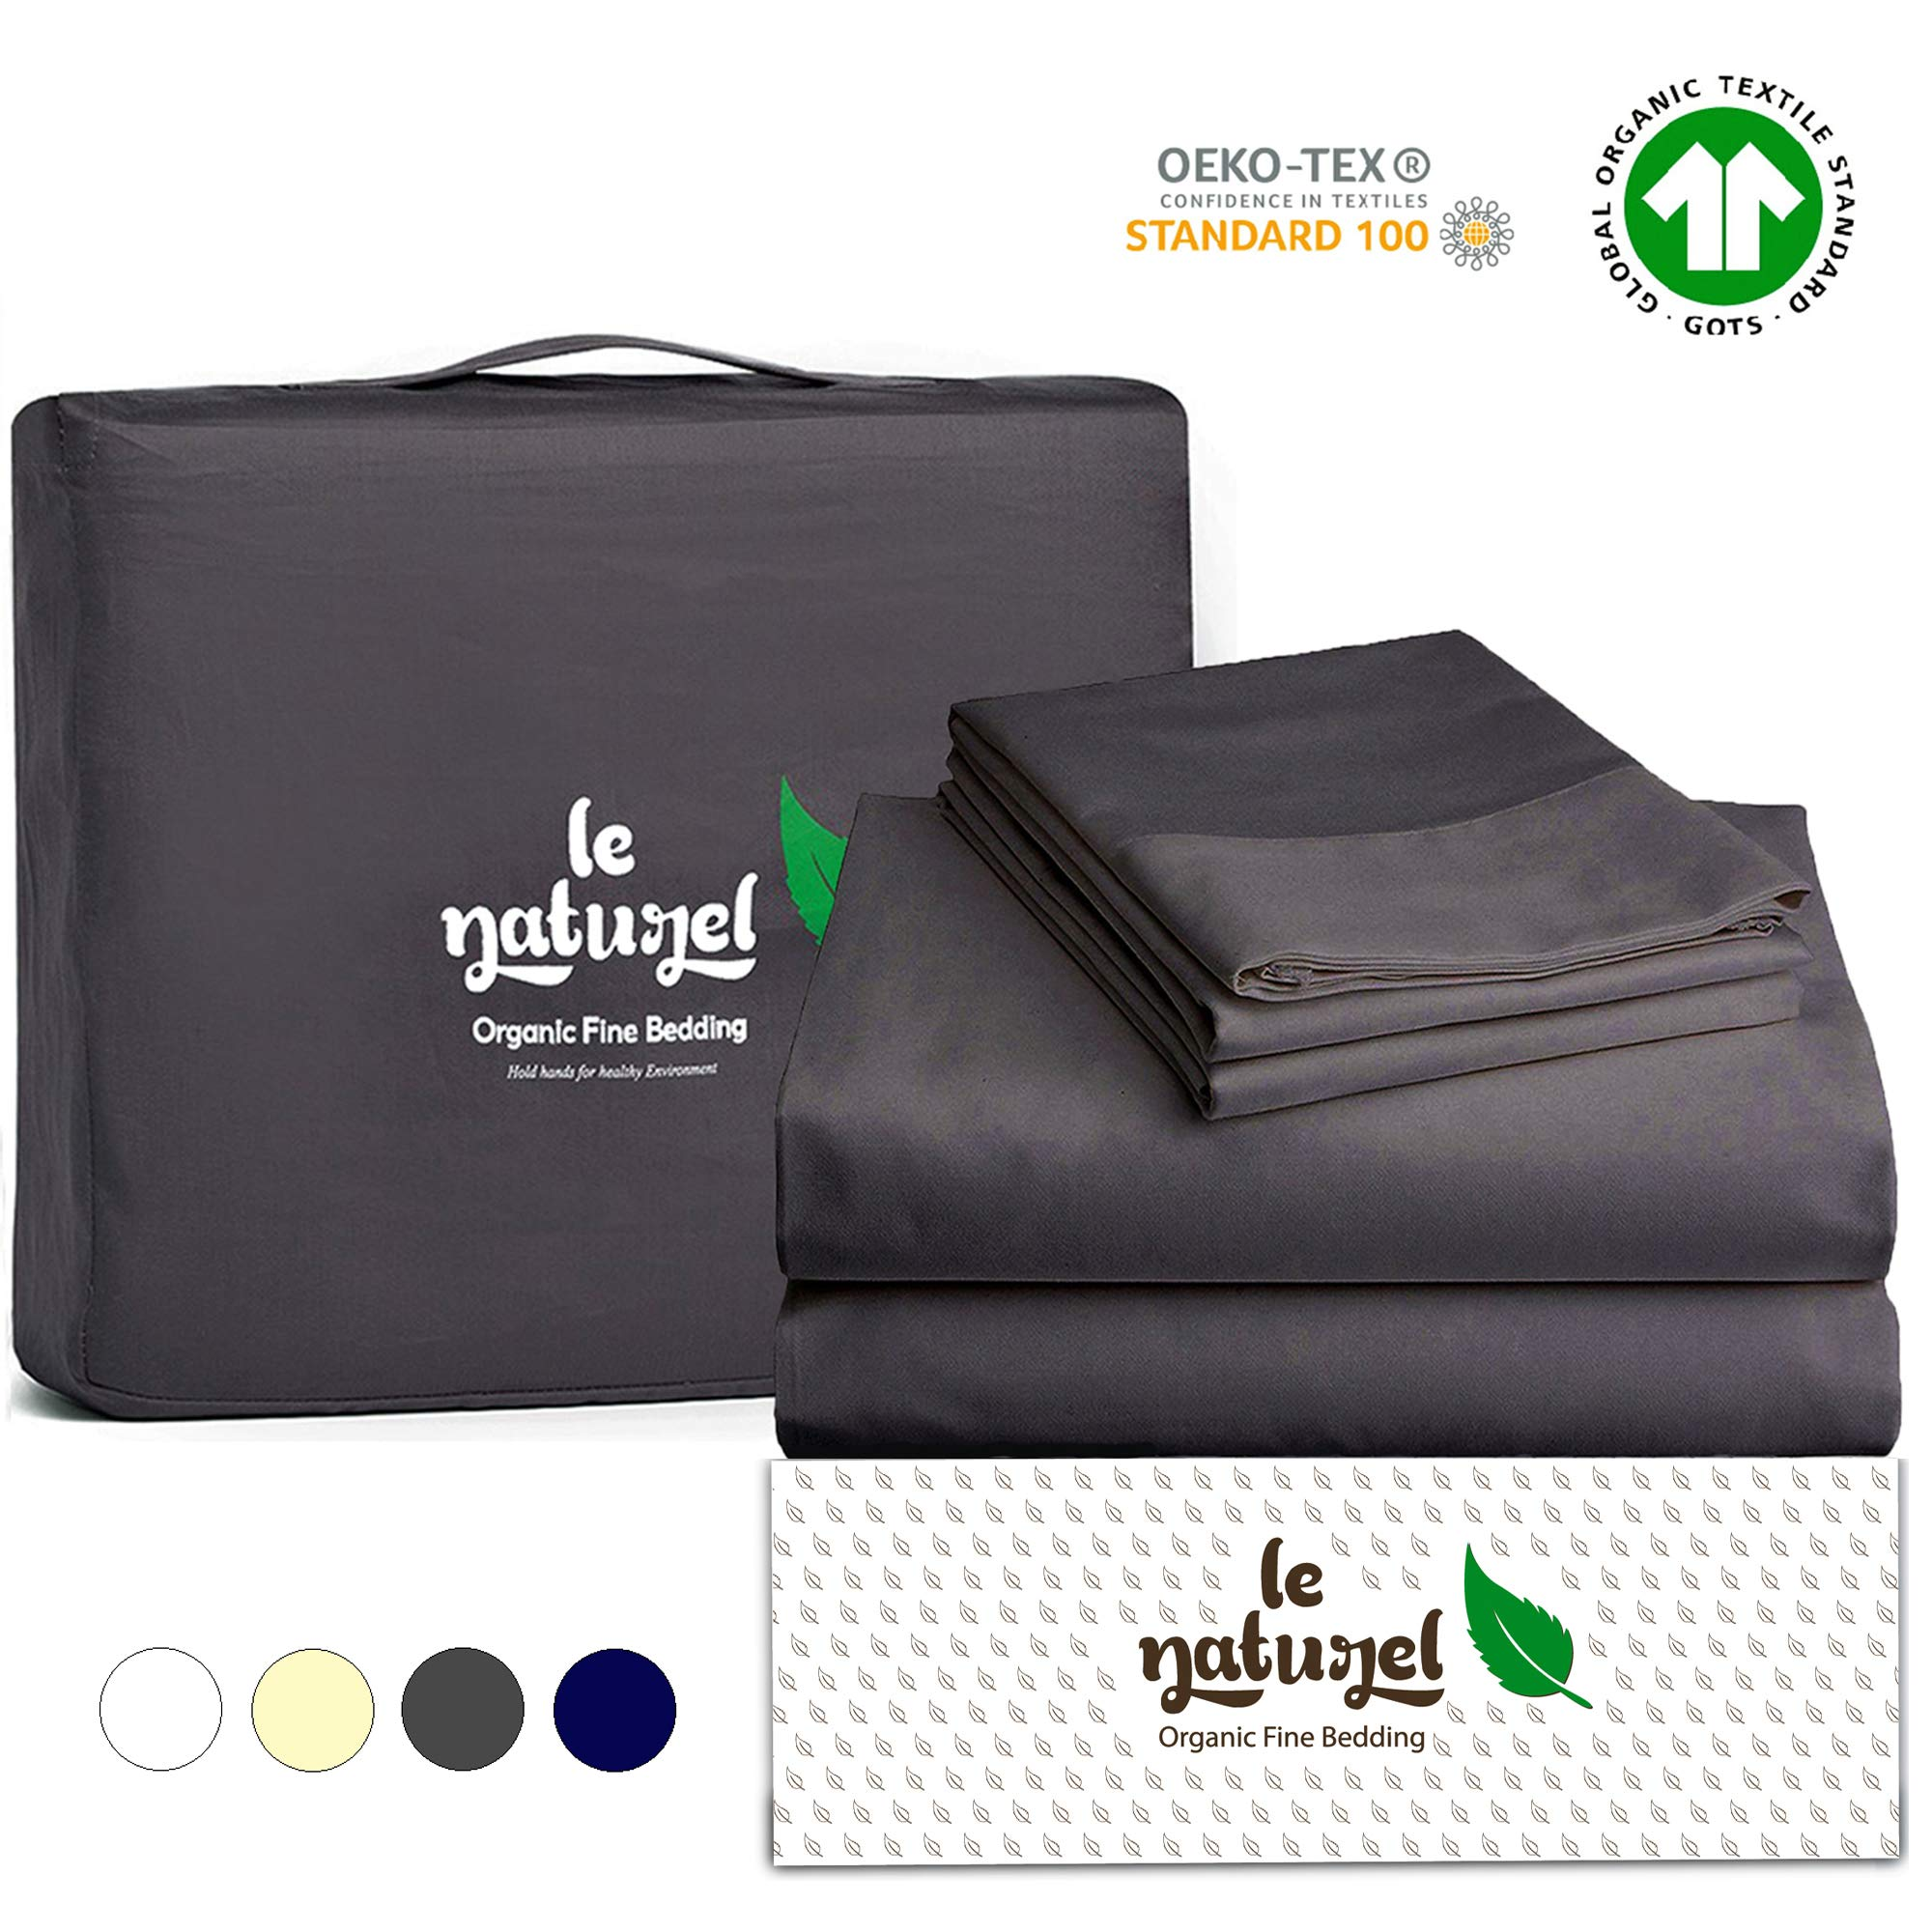 Le Naturel Organic Cotton Bed Sheets Twin - Organic Gray Sheets - 300 Thread Count Organic Cotton - Organic Cotton Sateen Sheets - Deep Pocket Organic Cotton Sheets - GOTS Certified Sheets